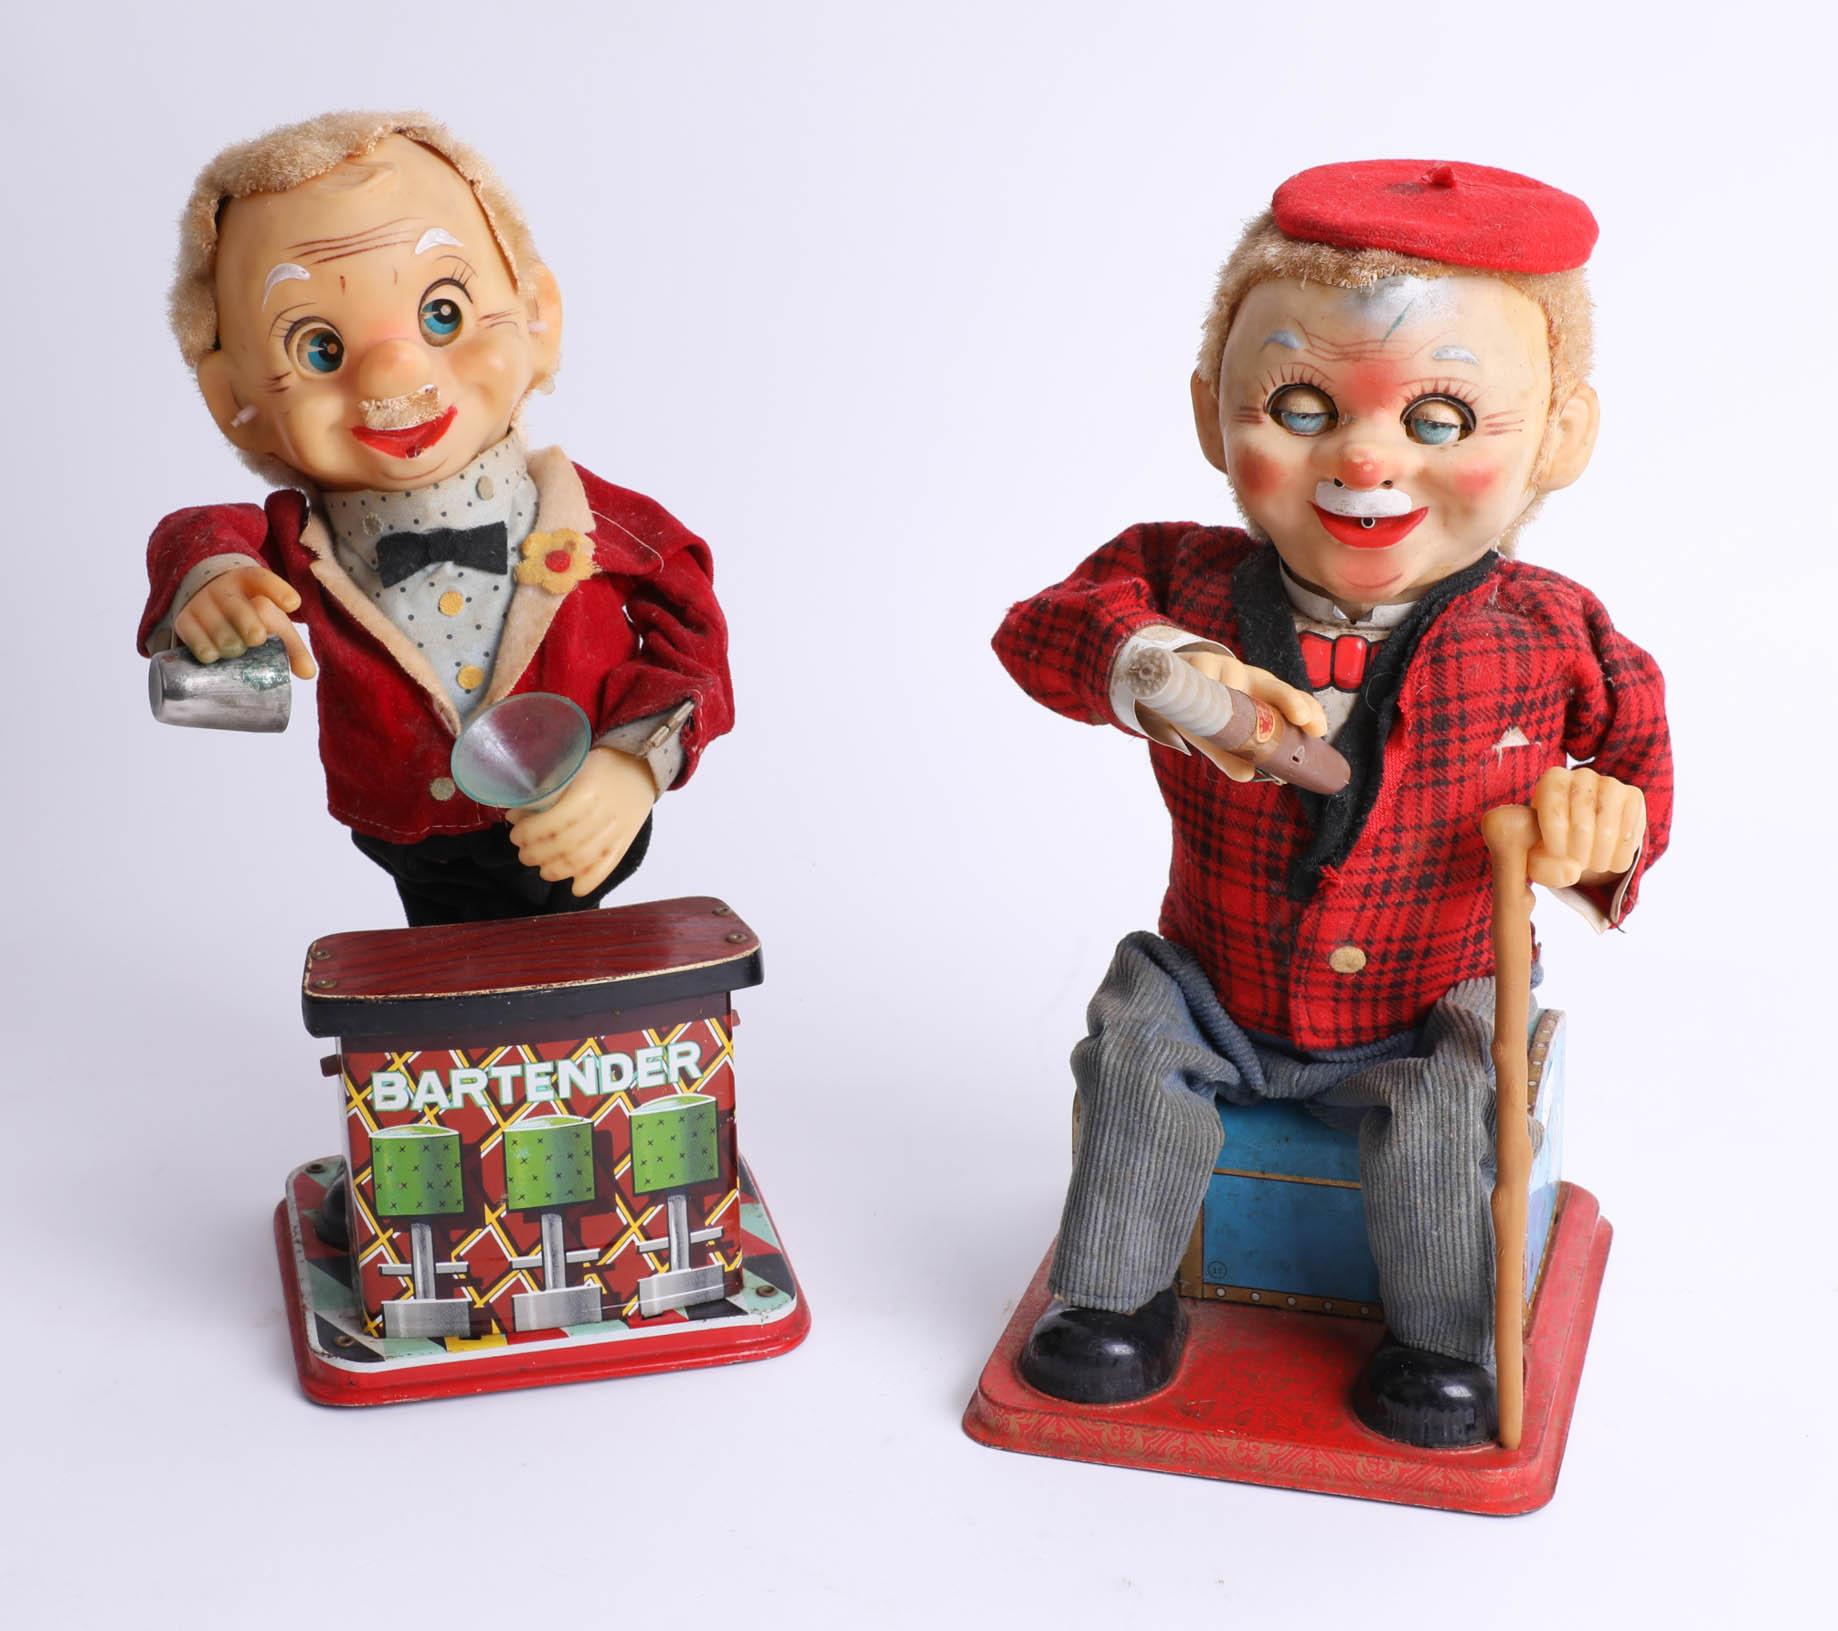 Lot 016 - Two Rosko tinplate Japanese mechanical toys, 'Bartender' and 'McGregor'.